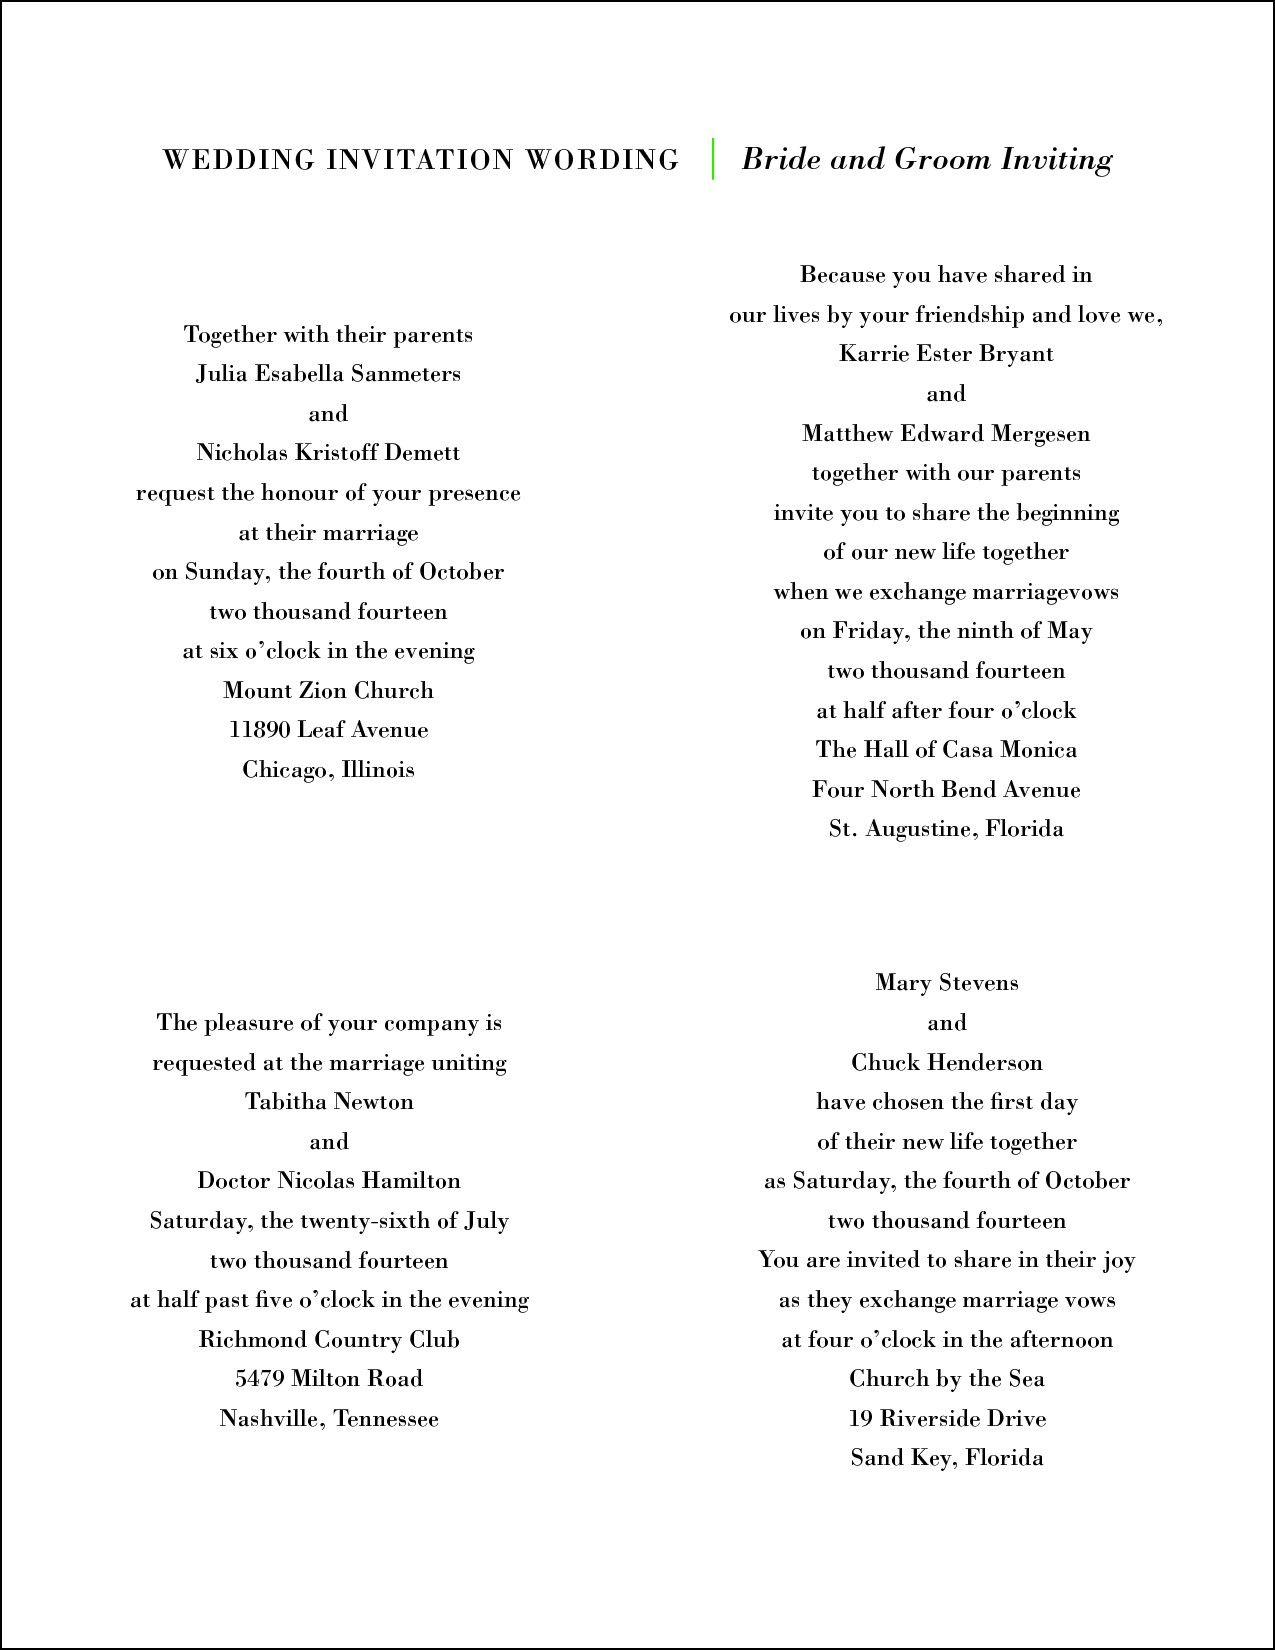 Wording for Wedding Invitations Bride and Groom Hosting